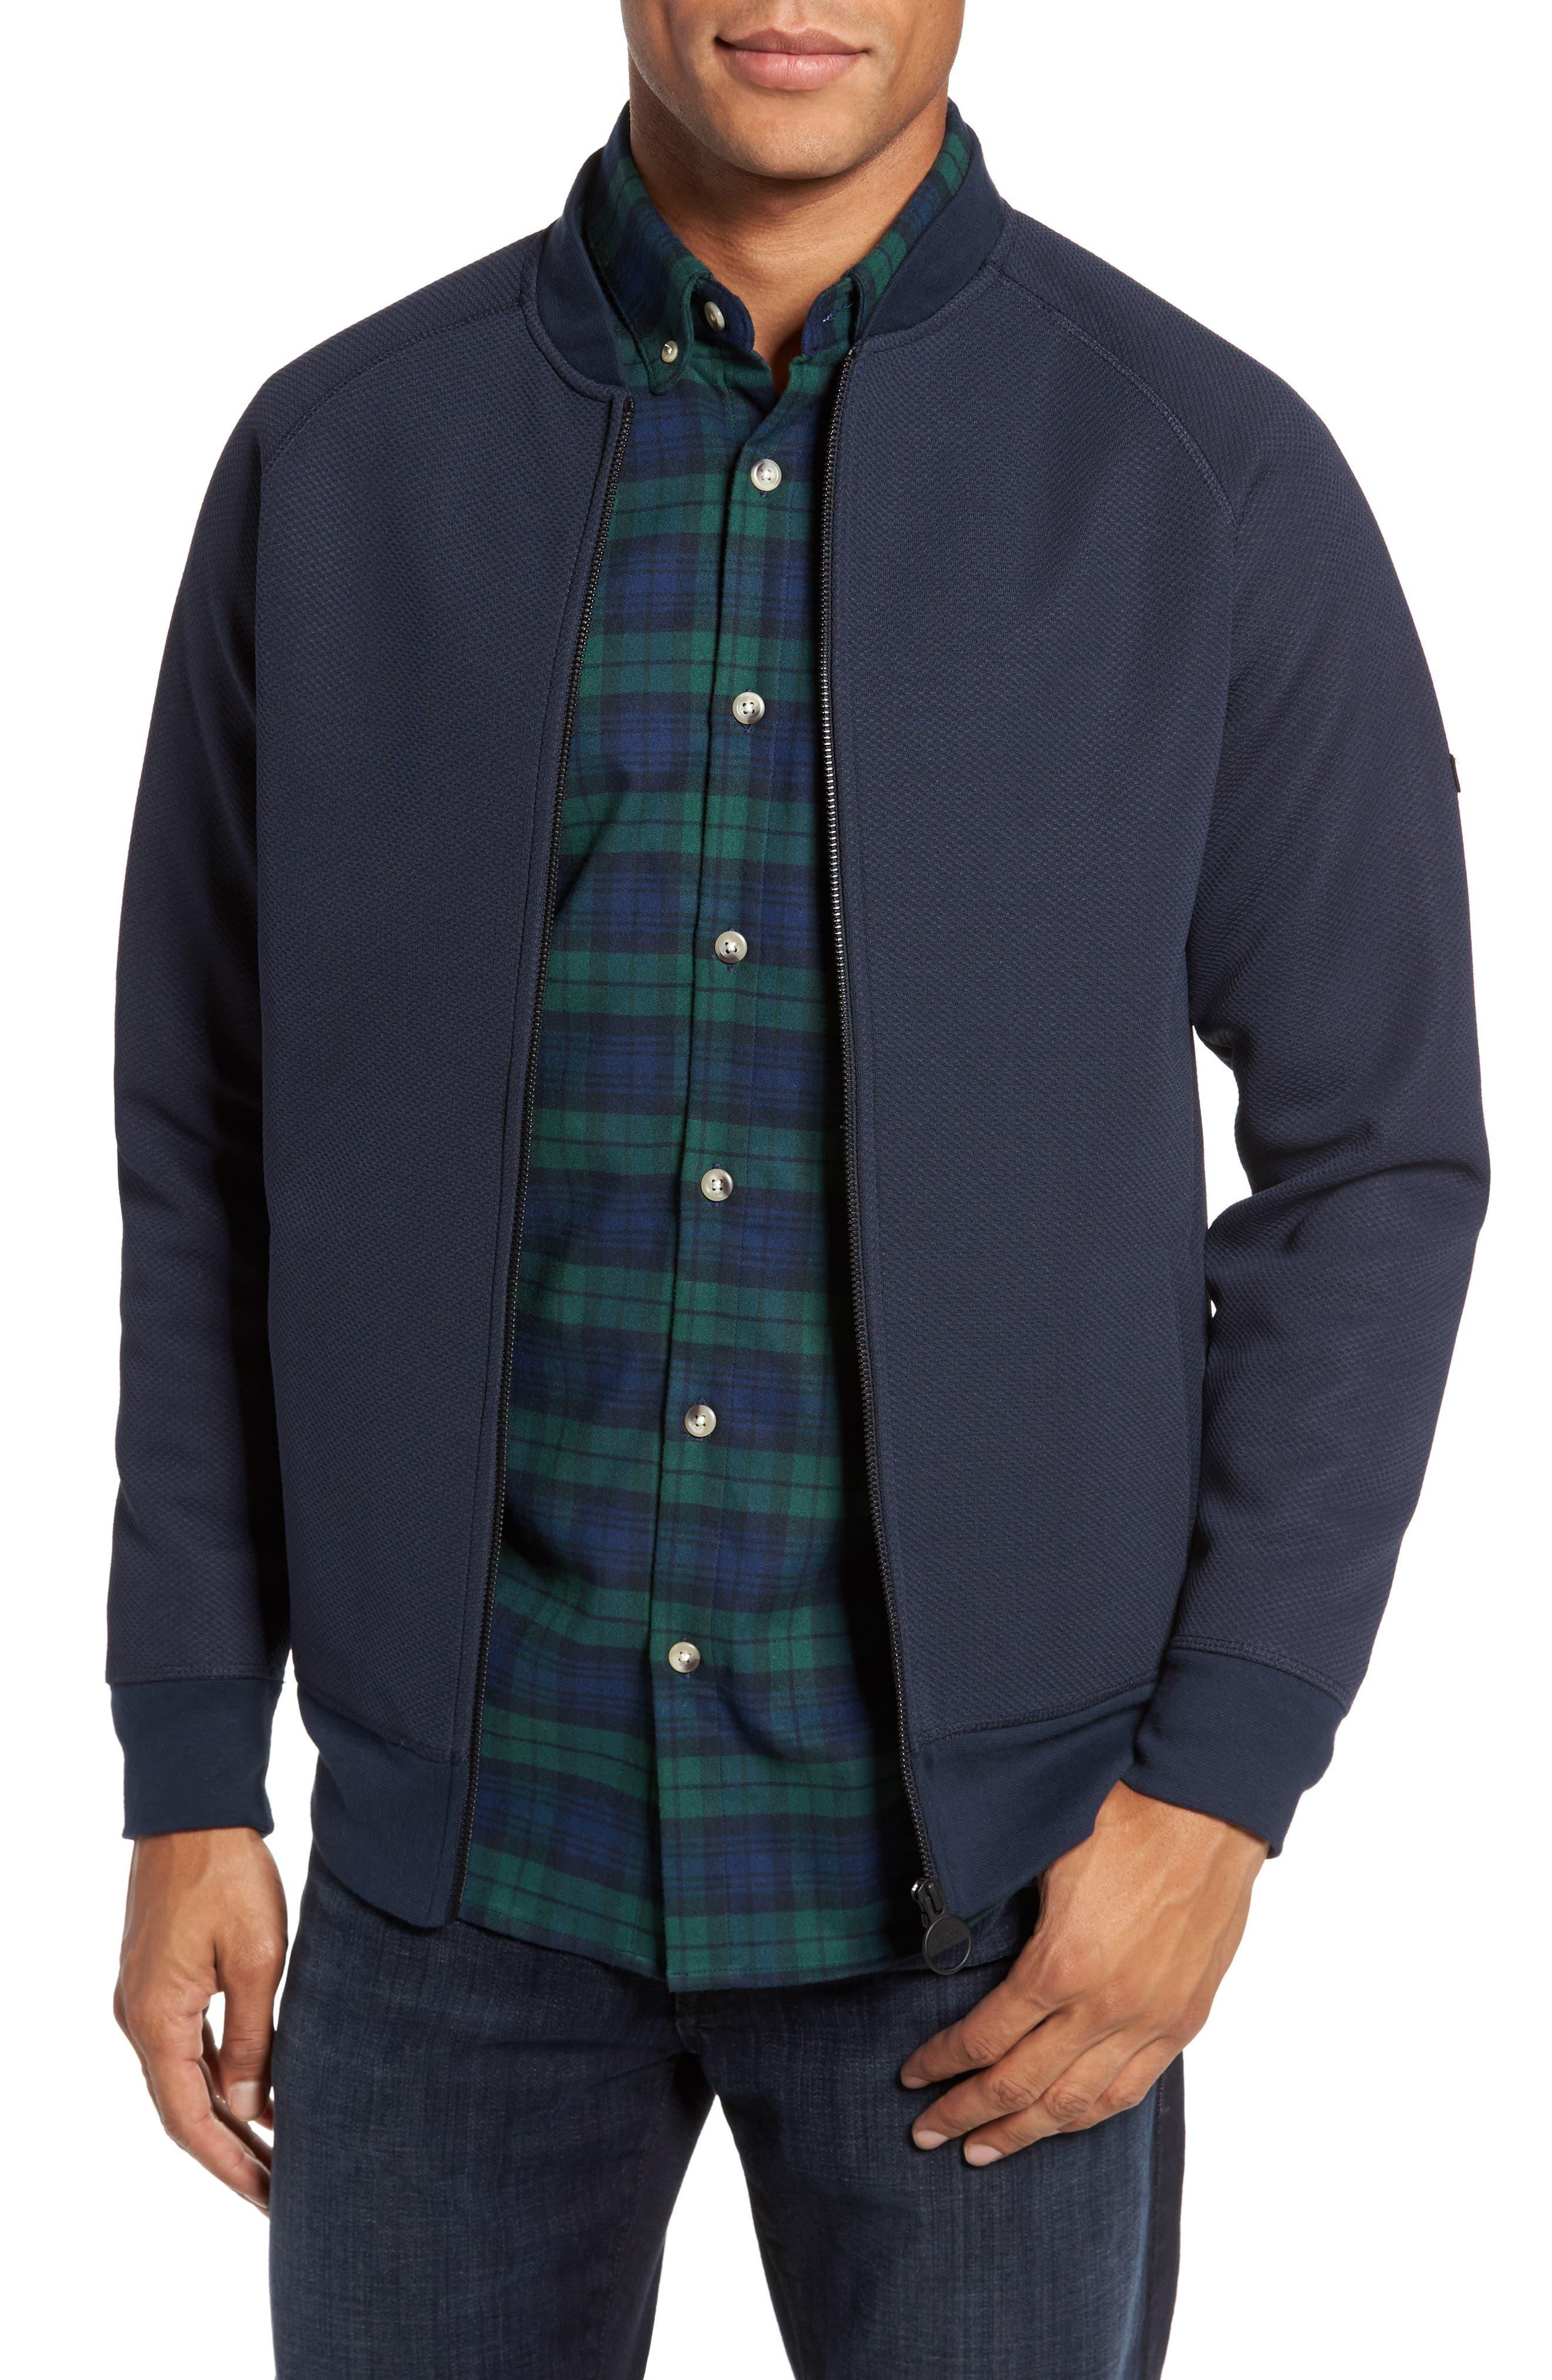 International Direction Sports Zip Front Jacket,                         Main,                         color, Dark Navy